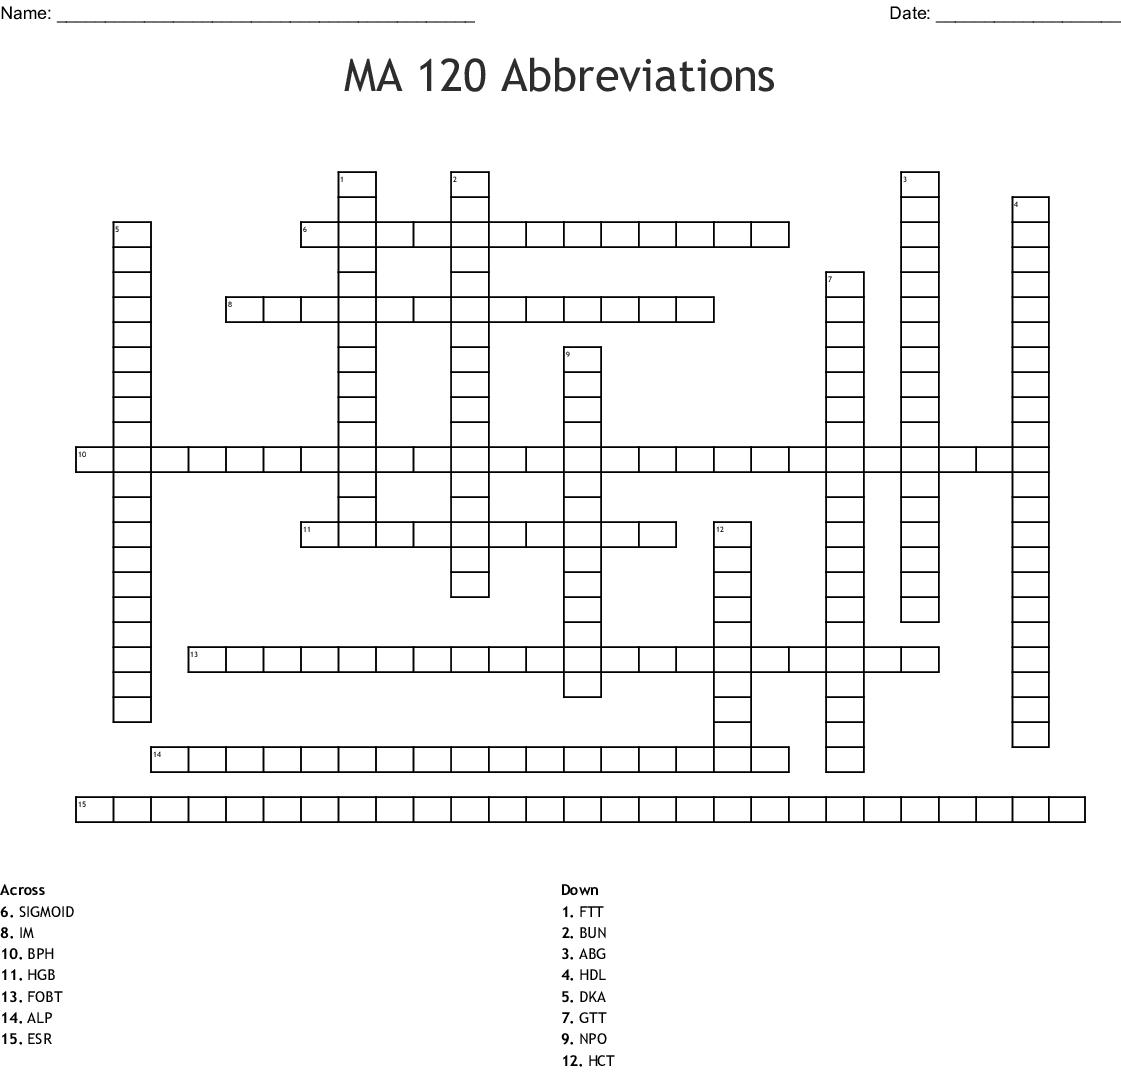 Medical Termiology Ch 4 Abriveations Crossword - WordMint